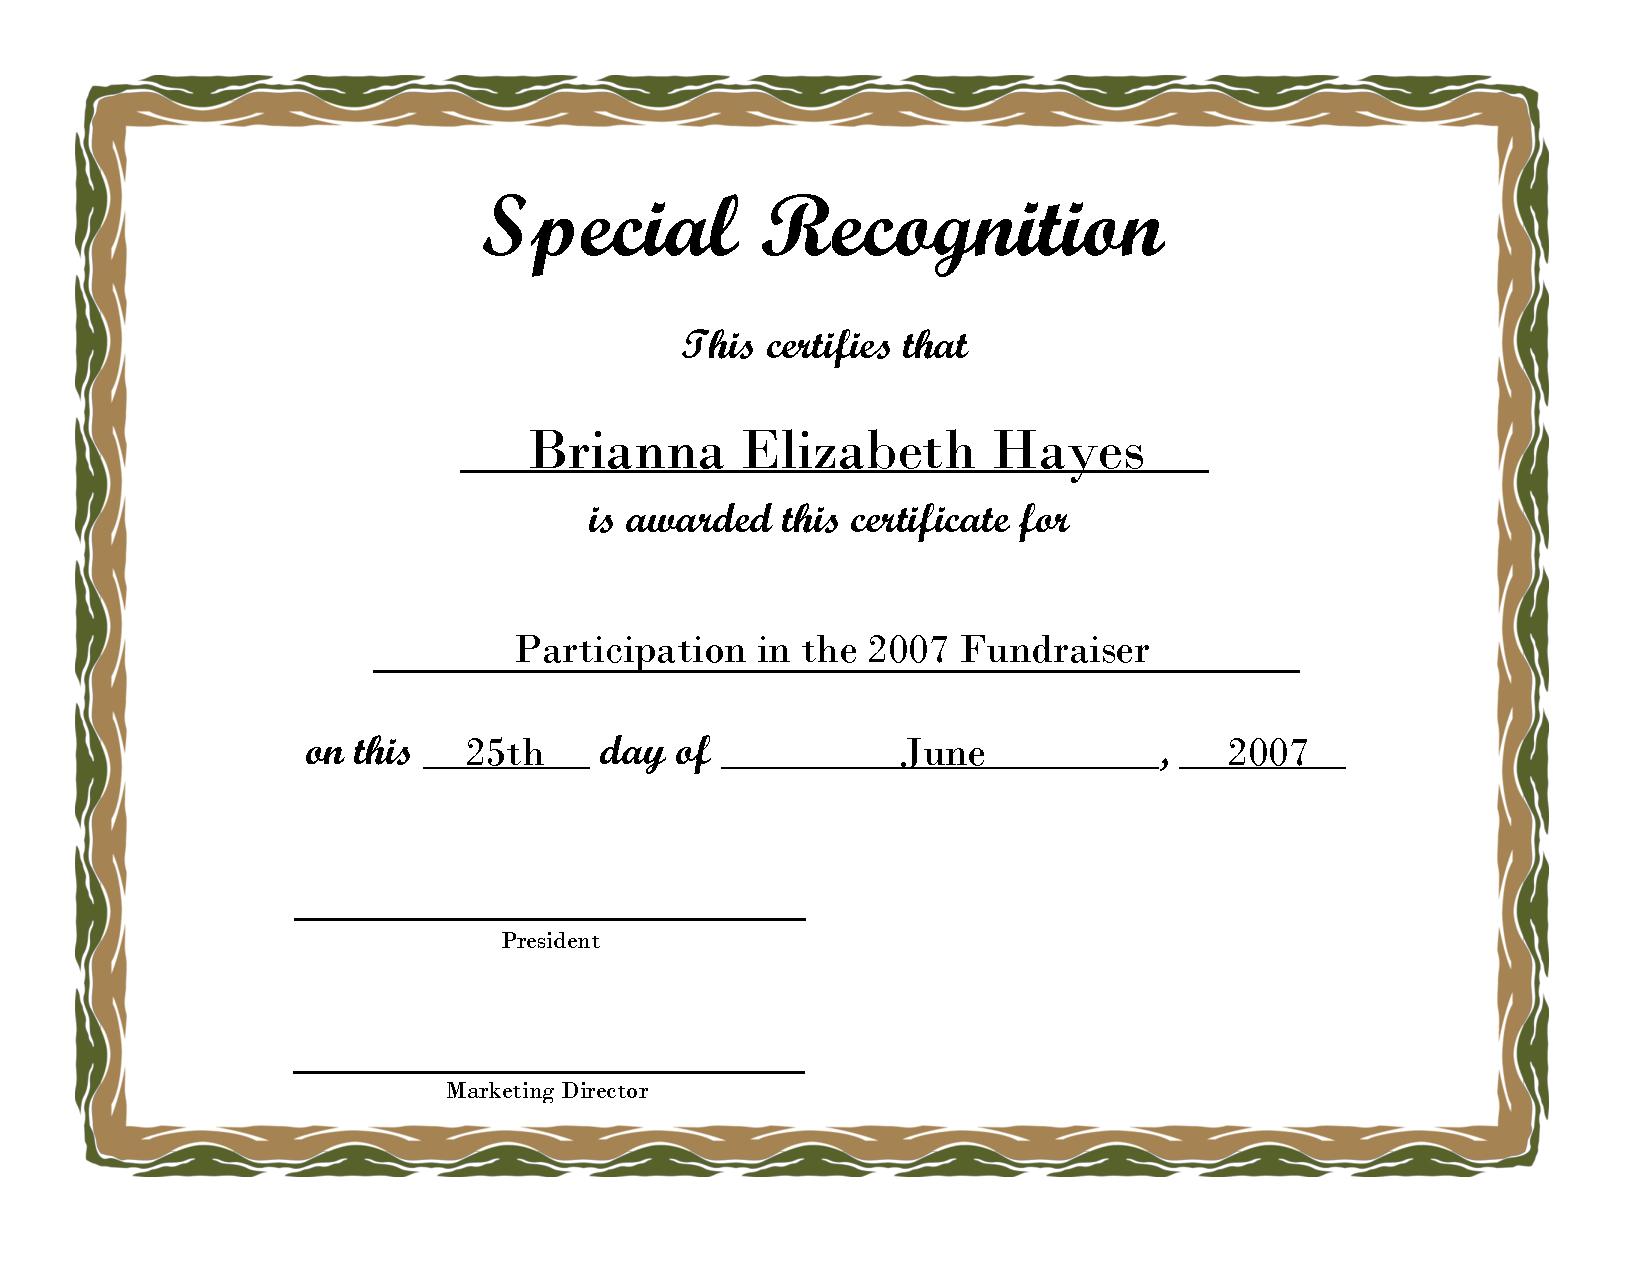 Free Printable Award Certificate Borders | Free Printable - Free Printable Certificates